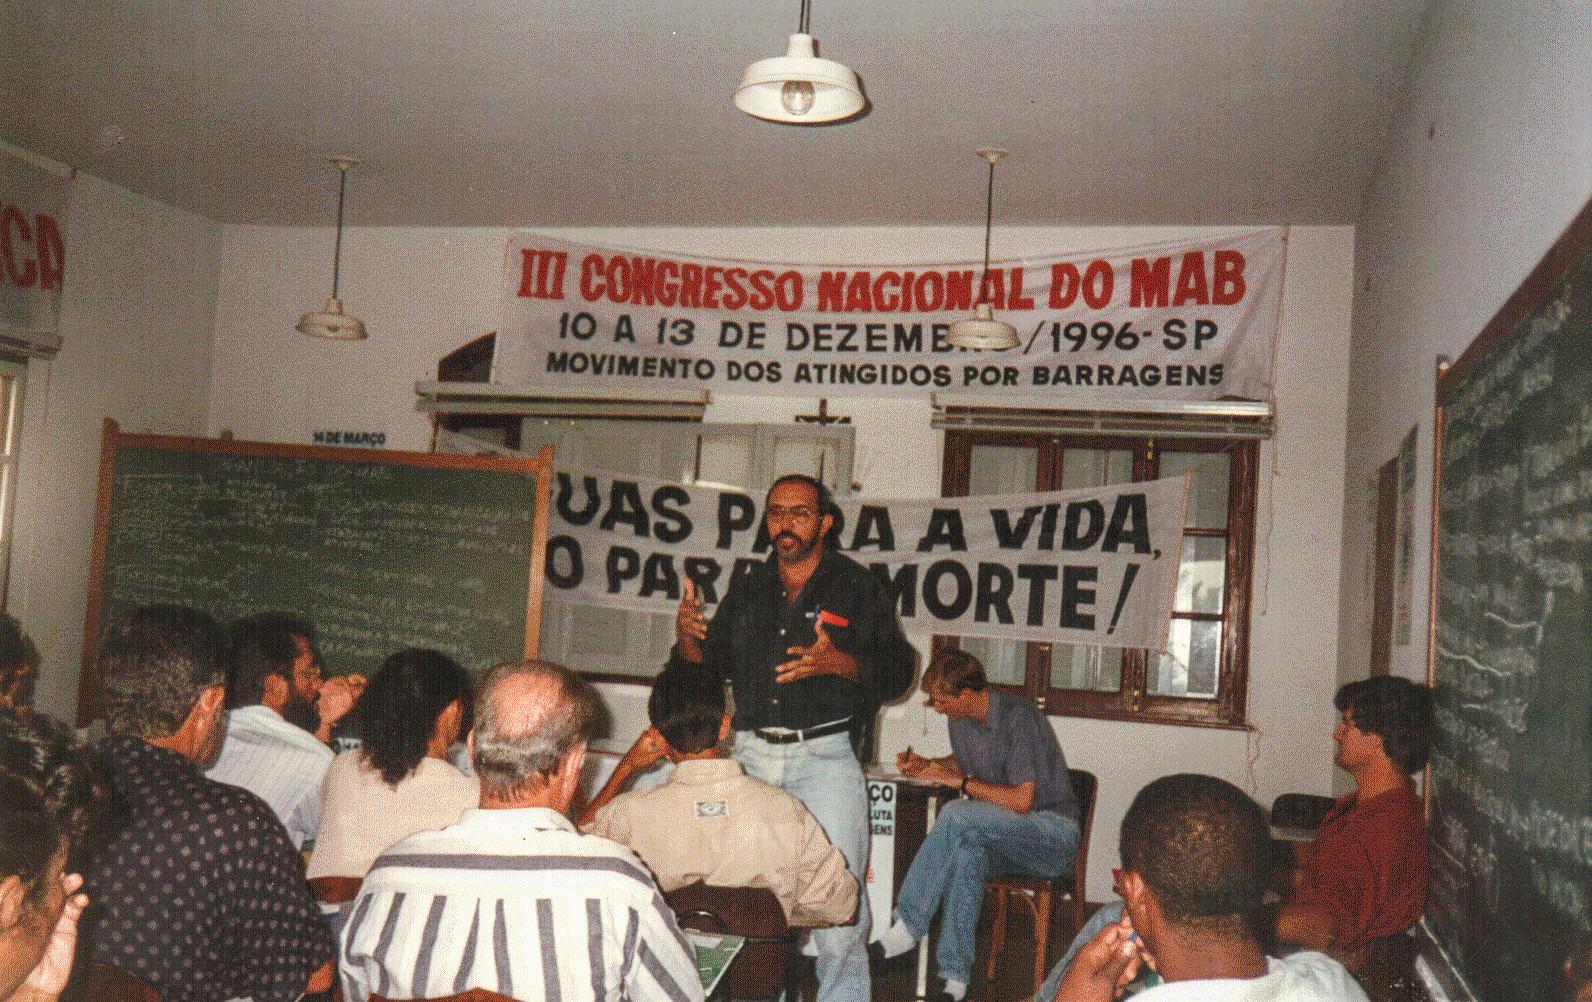 III Congresso Nacional do MAB